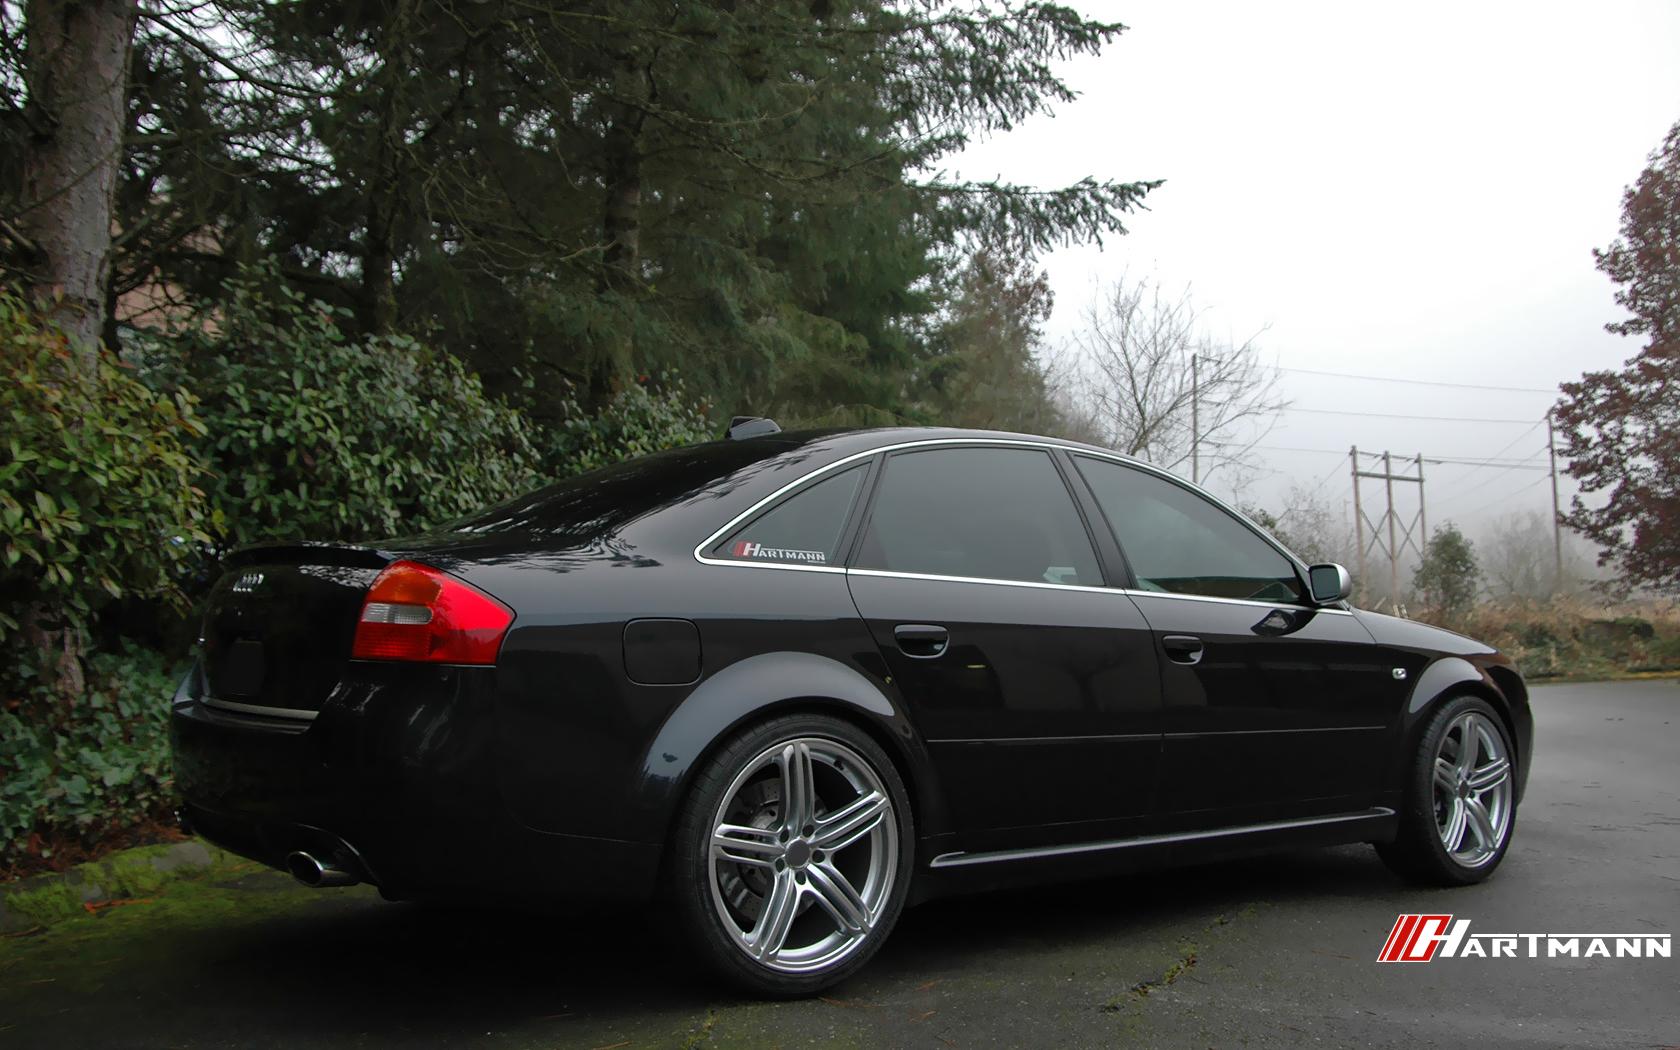 Hartmann Hrs6 204 Gs Wheels For Audi Fitment Hartmann Wheels